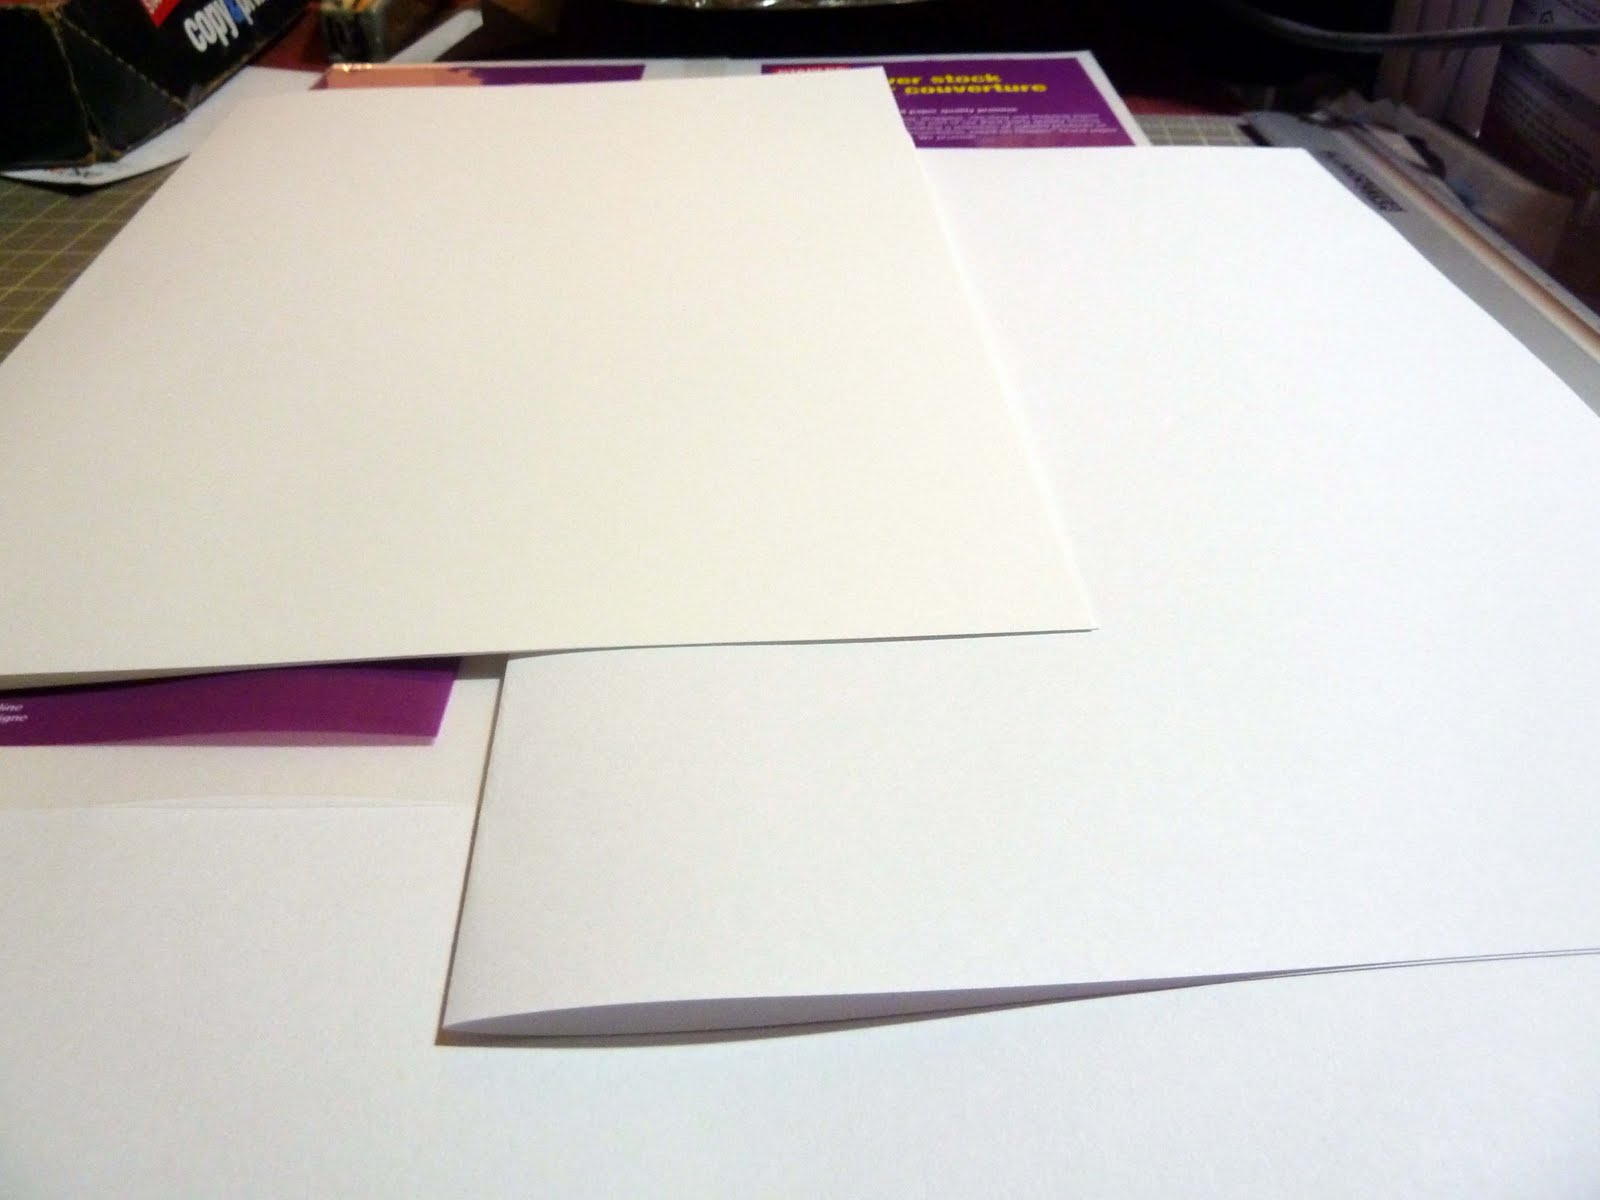 Staples paper stock options